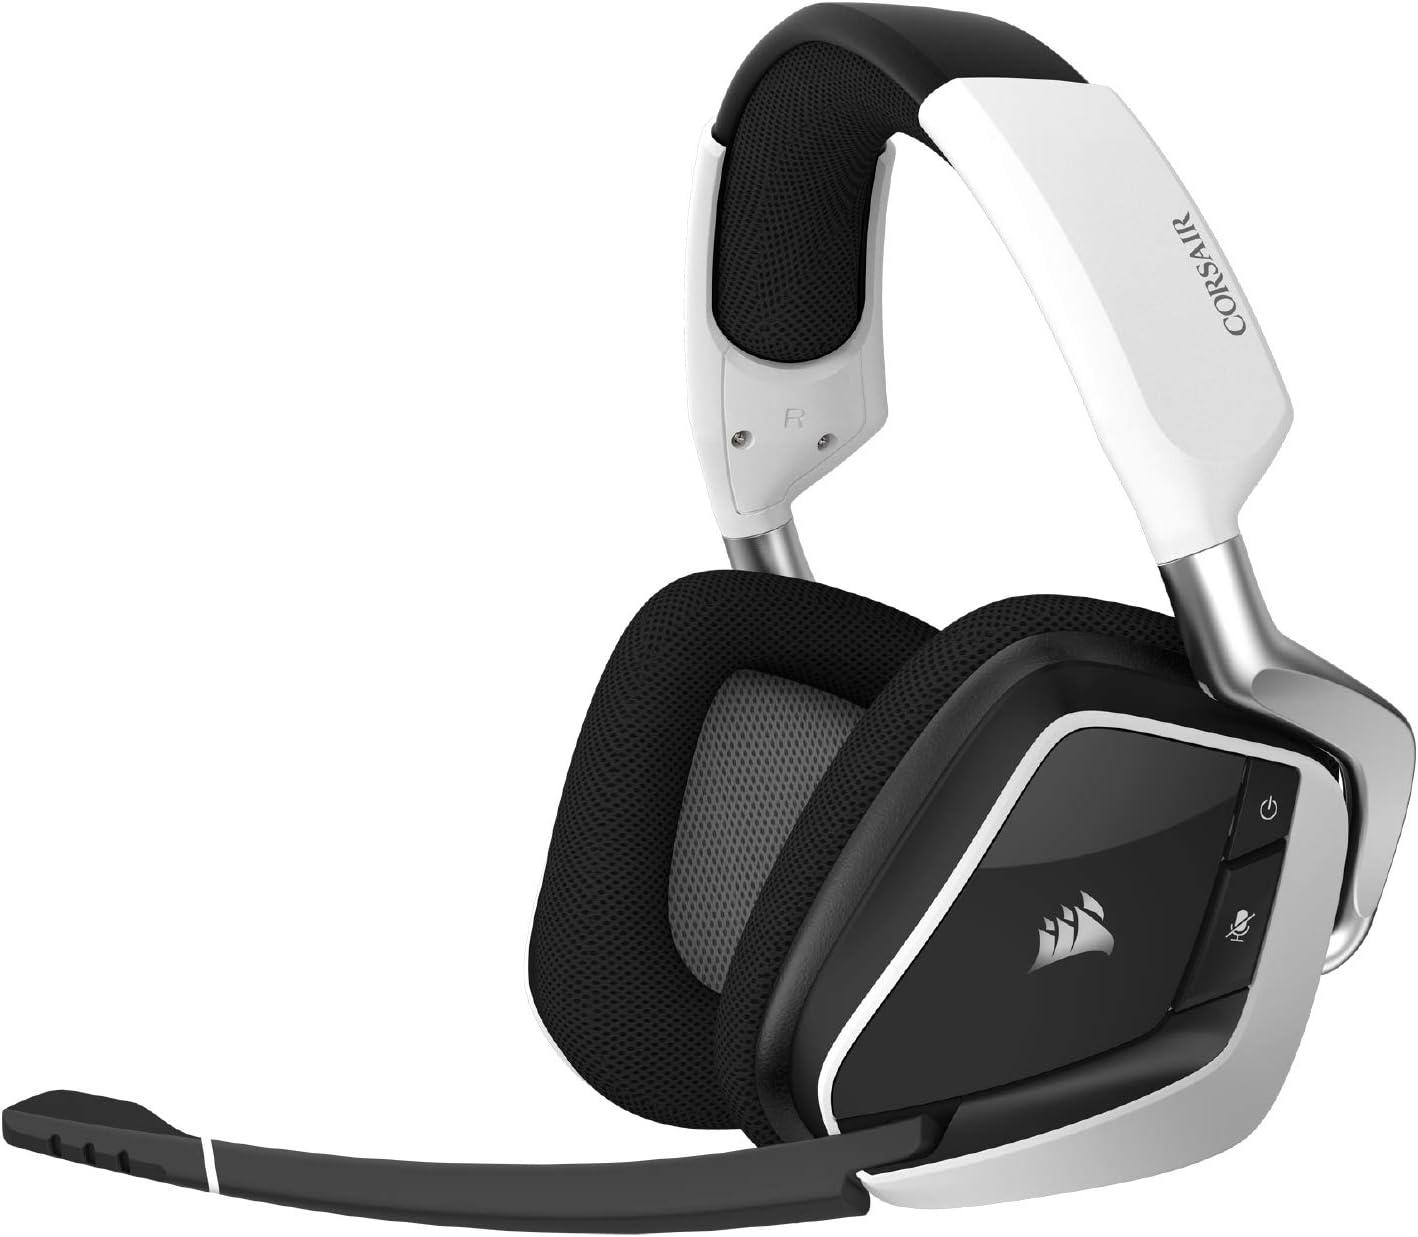 Corsair Void RGB Elite Wireless Gaming Headset